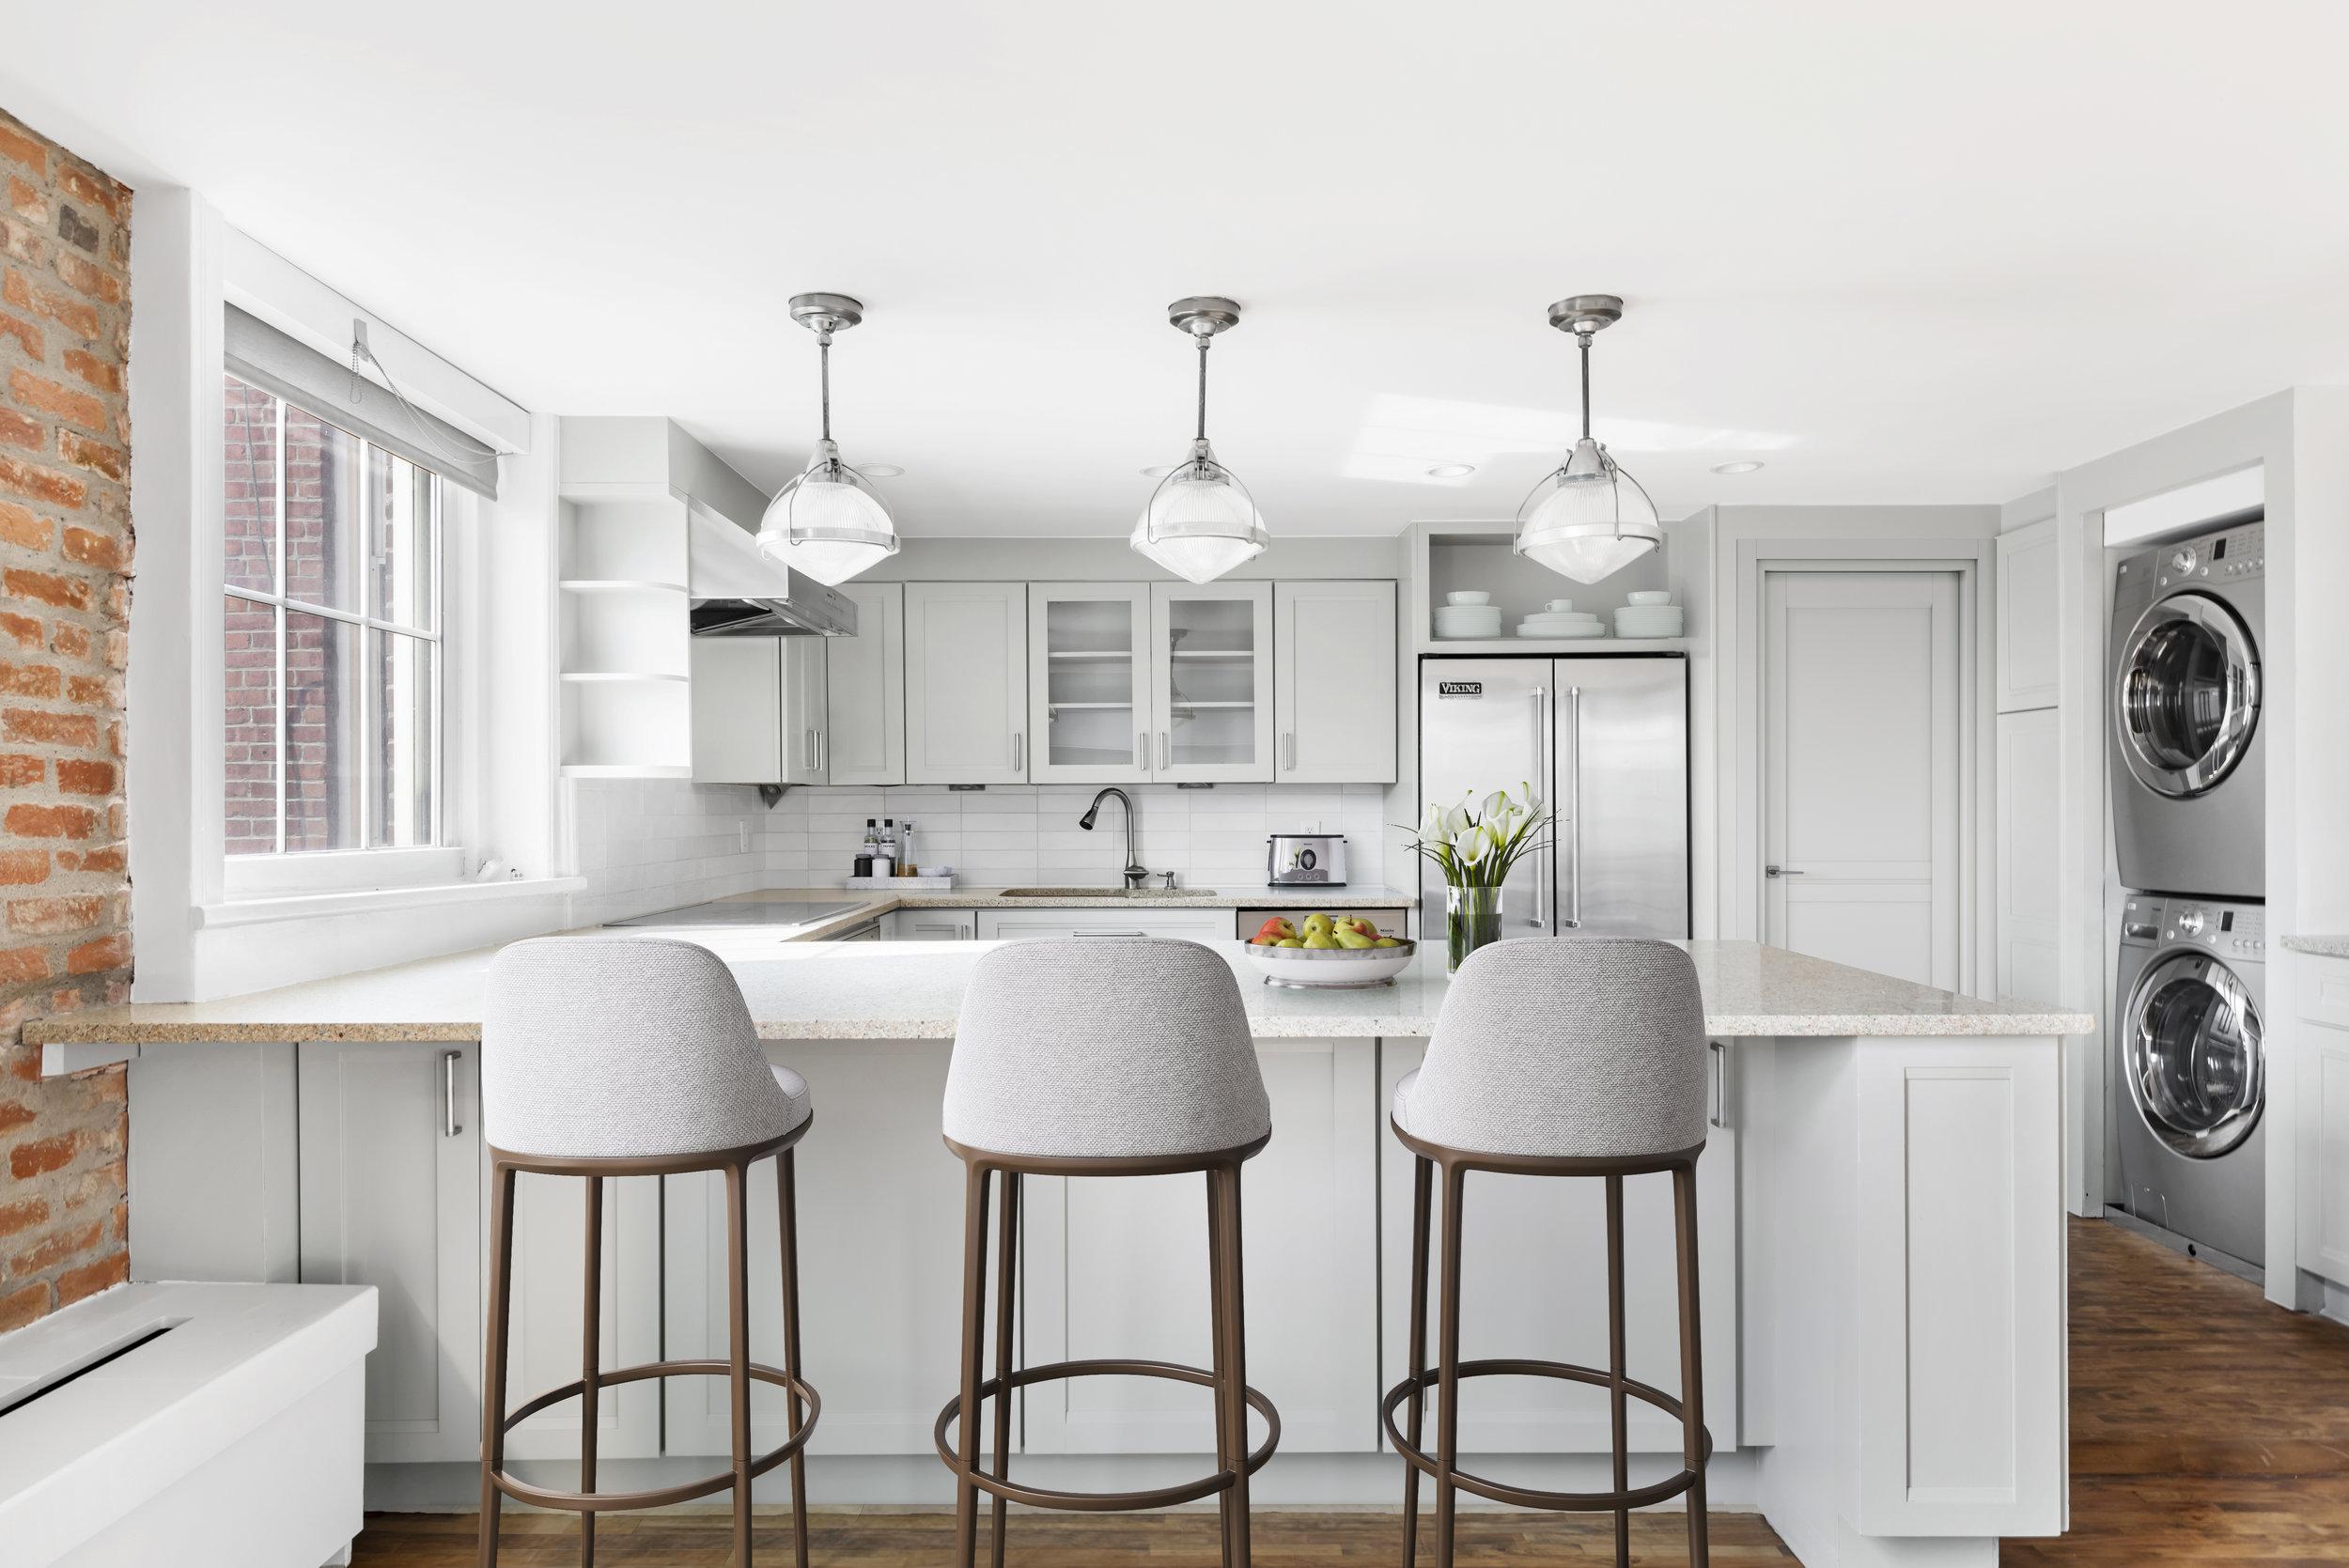 kitchen-2-by-bolster-SMART-renovation.jpg